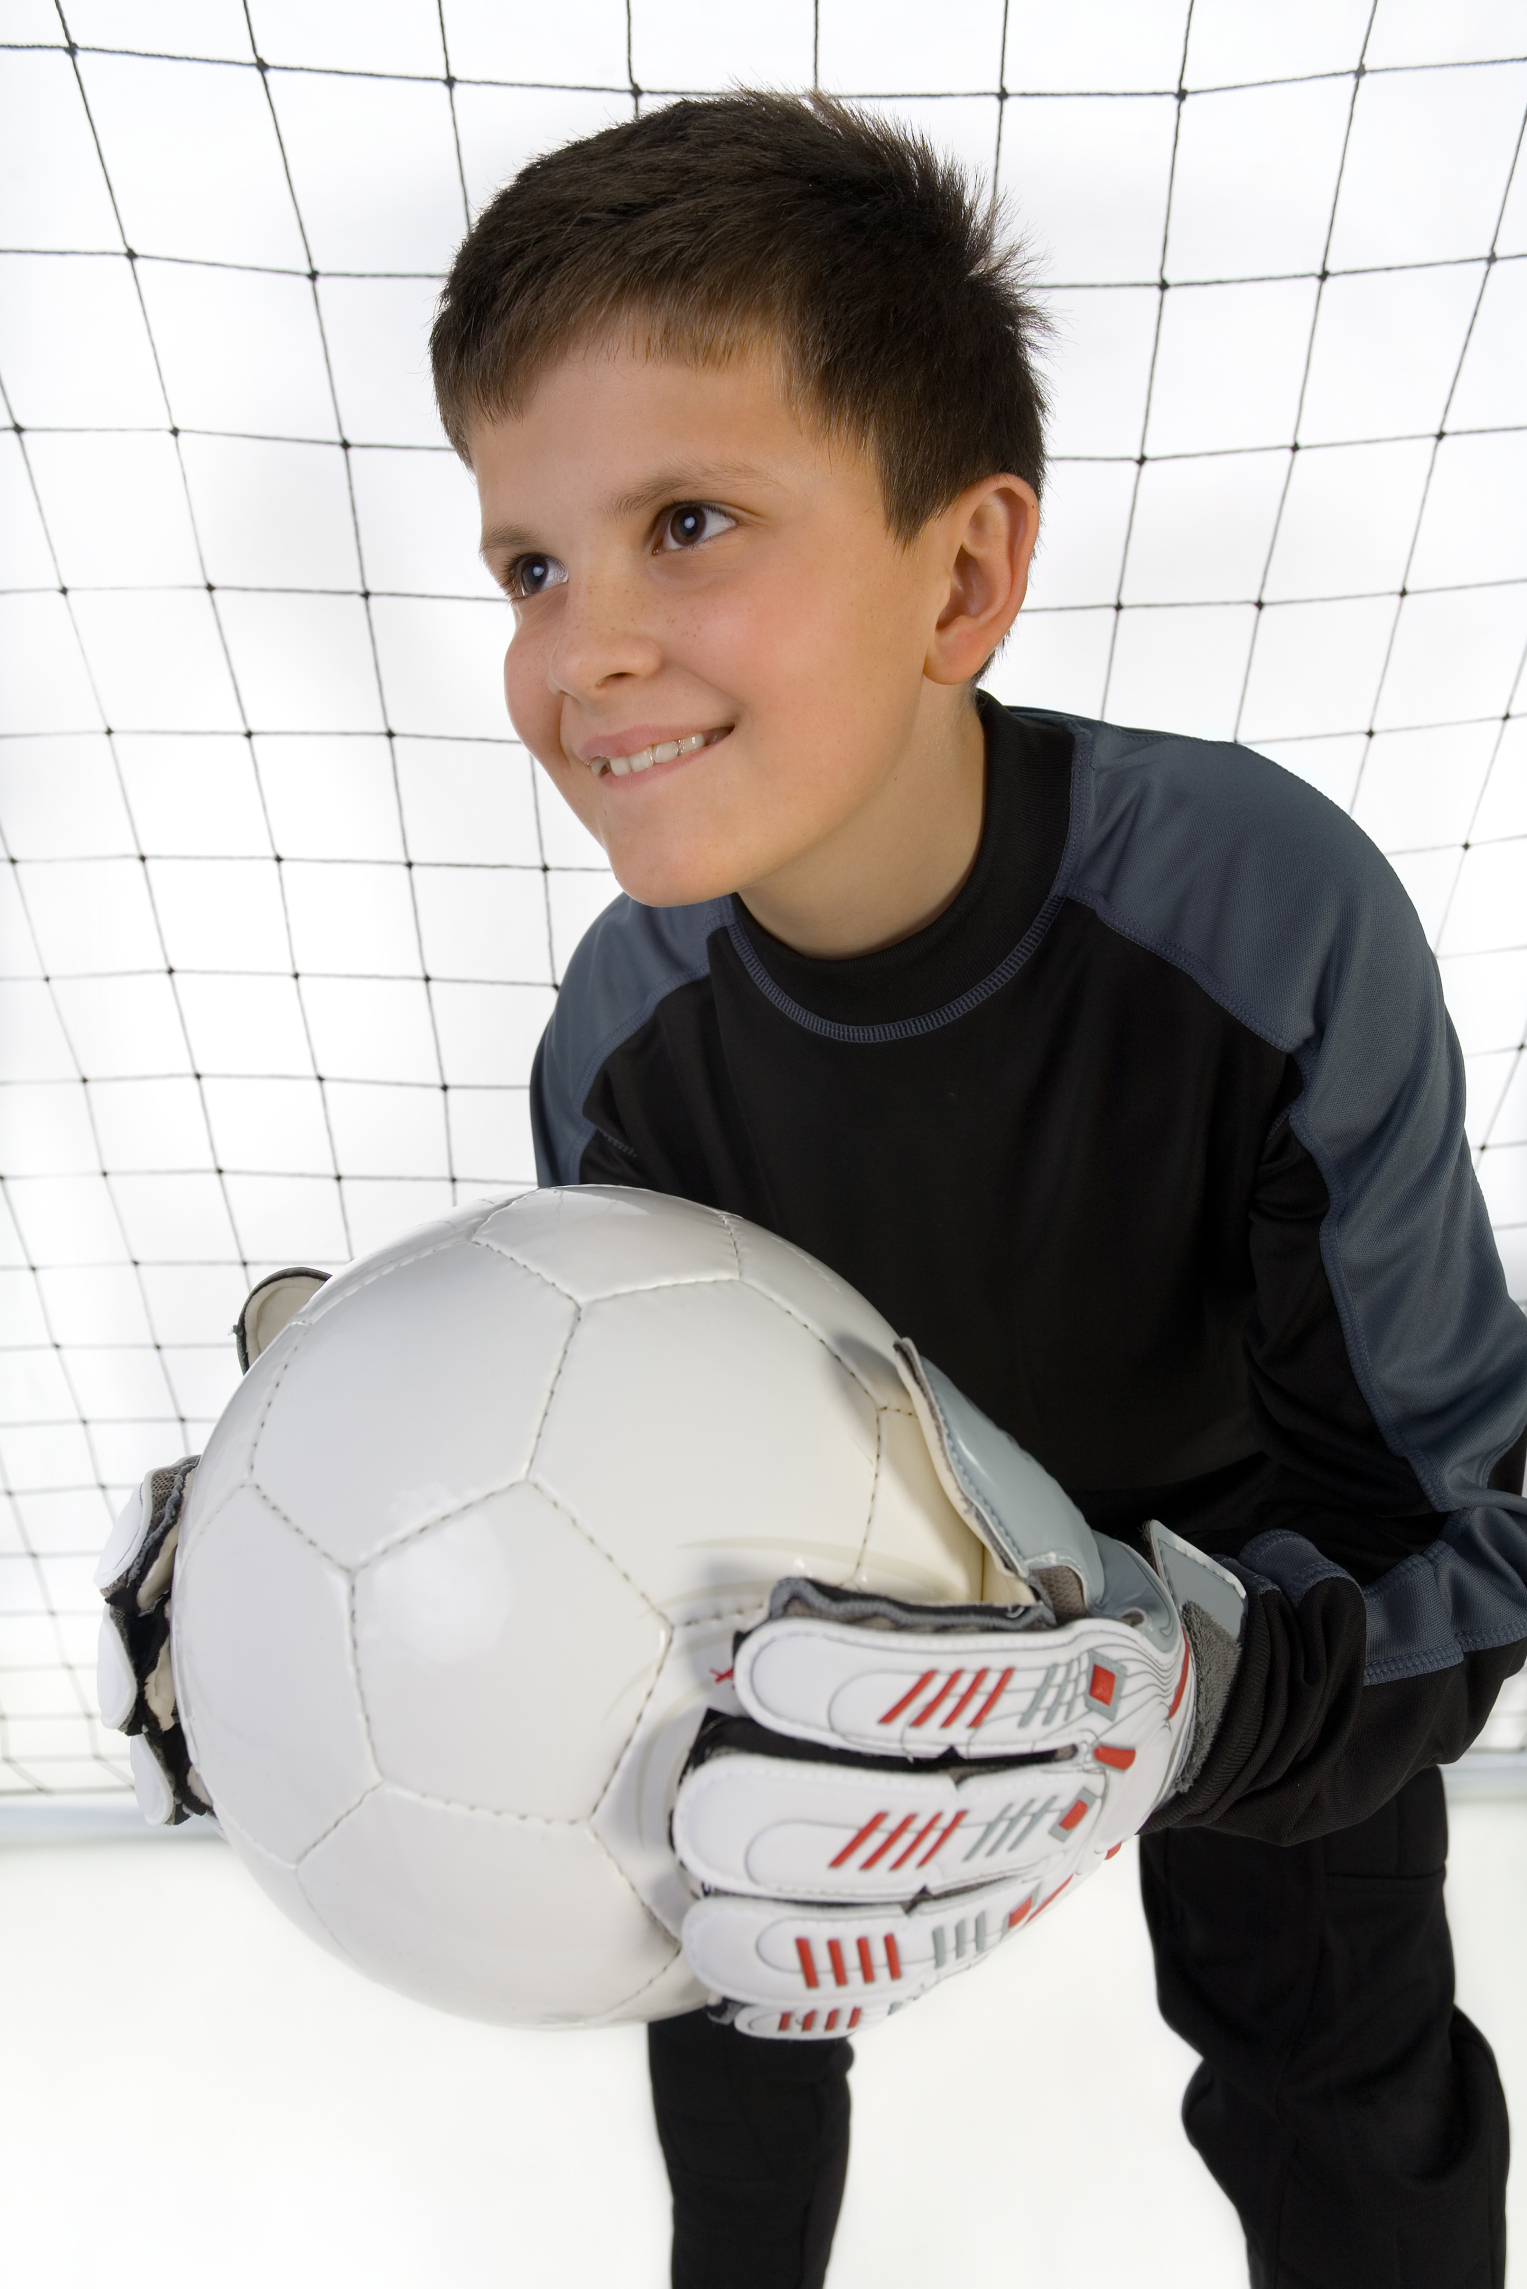 How To Determine Children S Hand Size For Goalie Gloves Healthfully